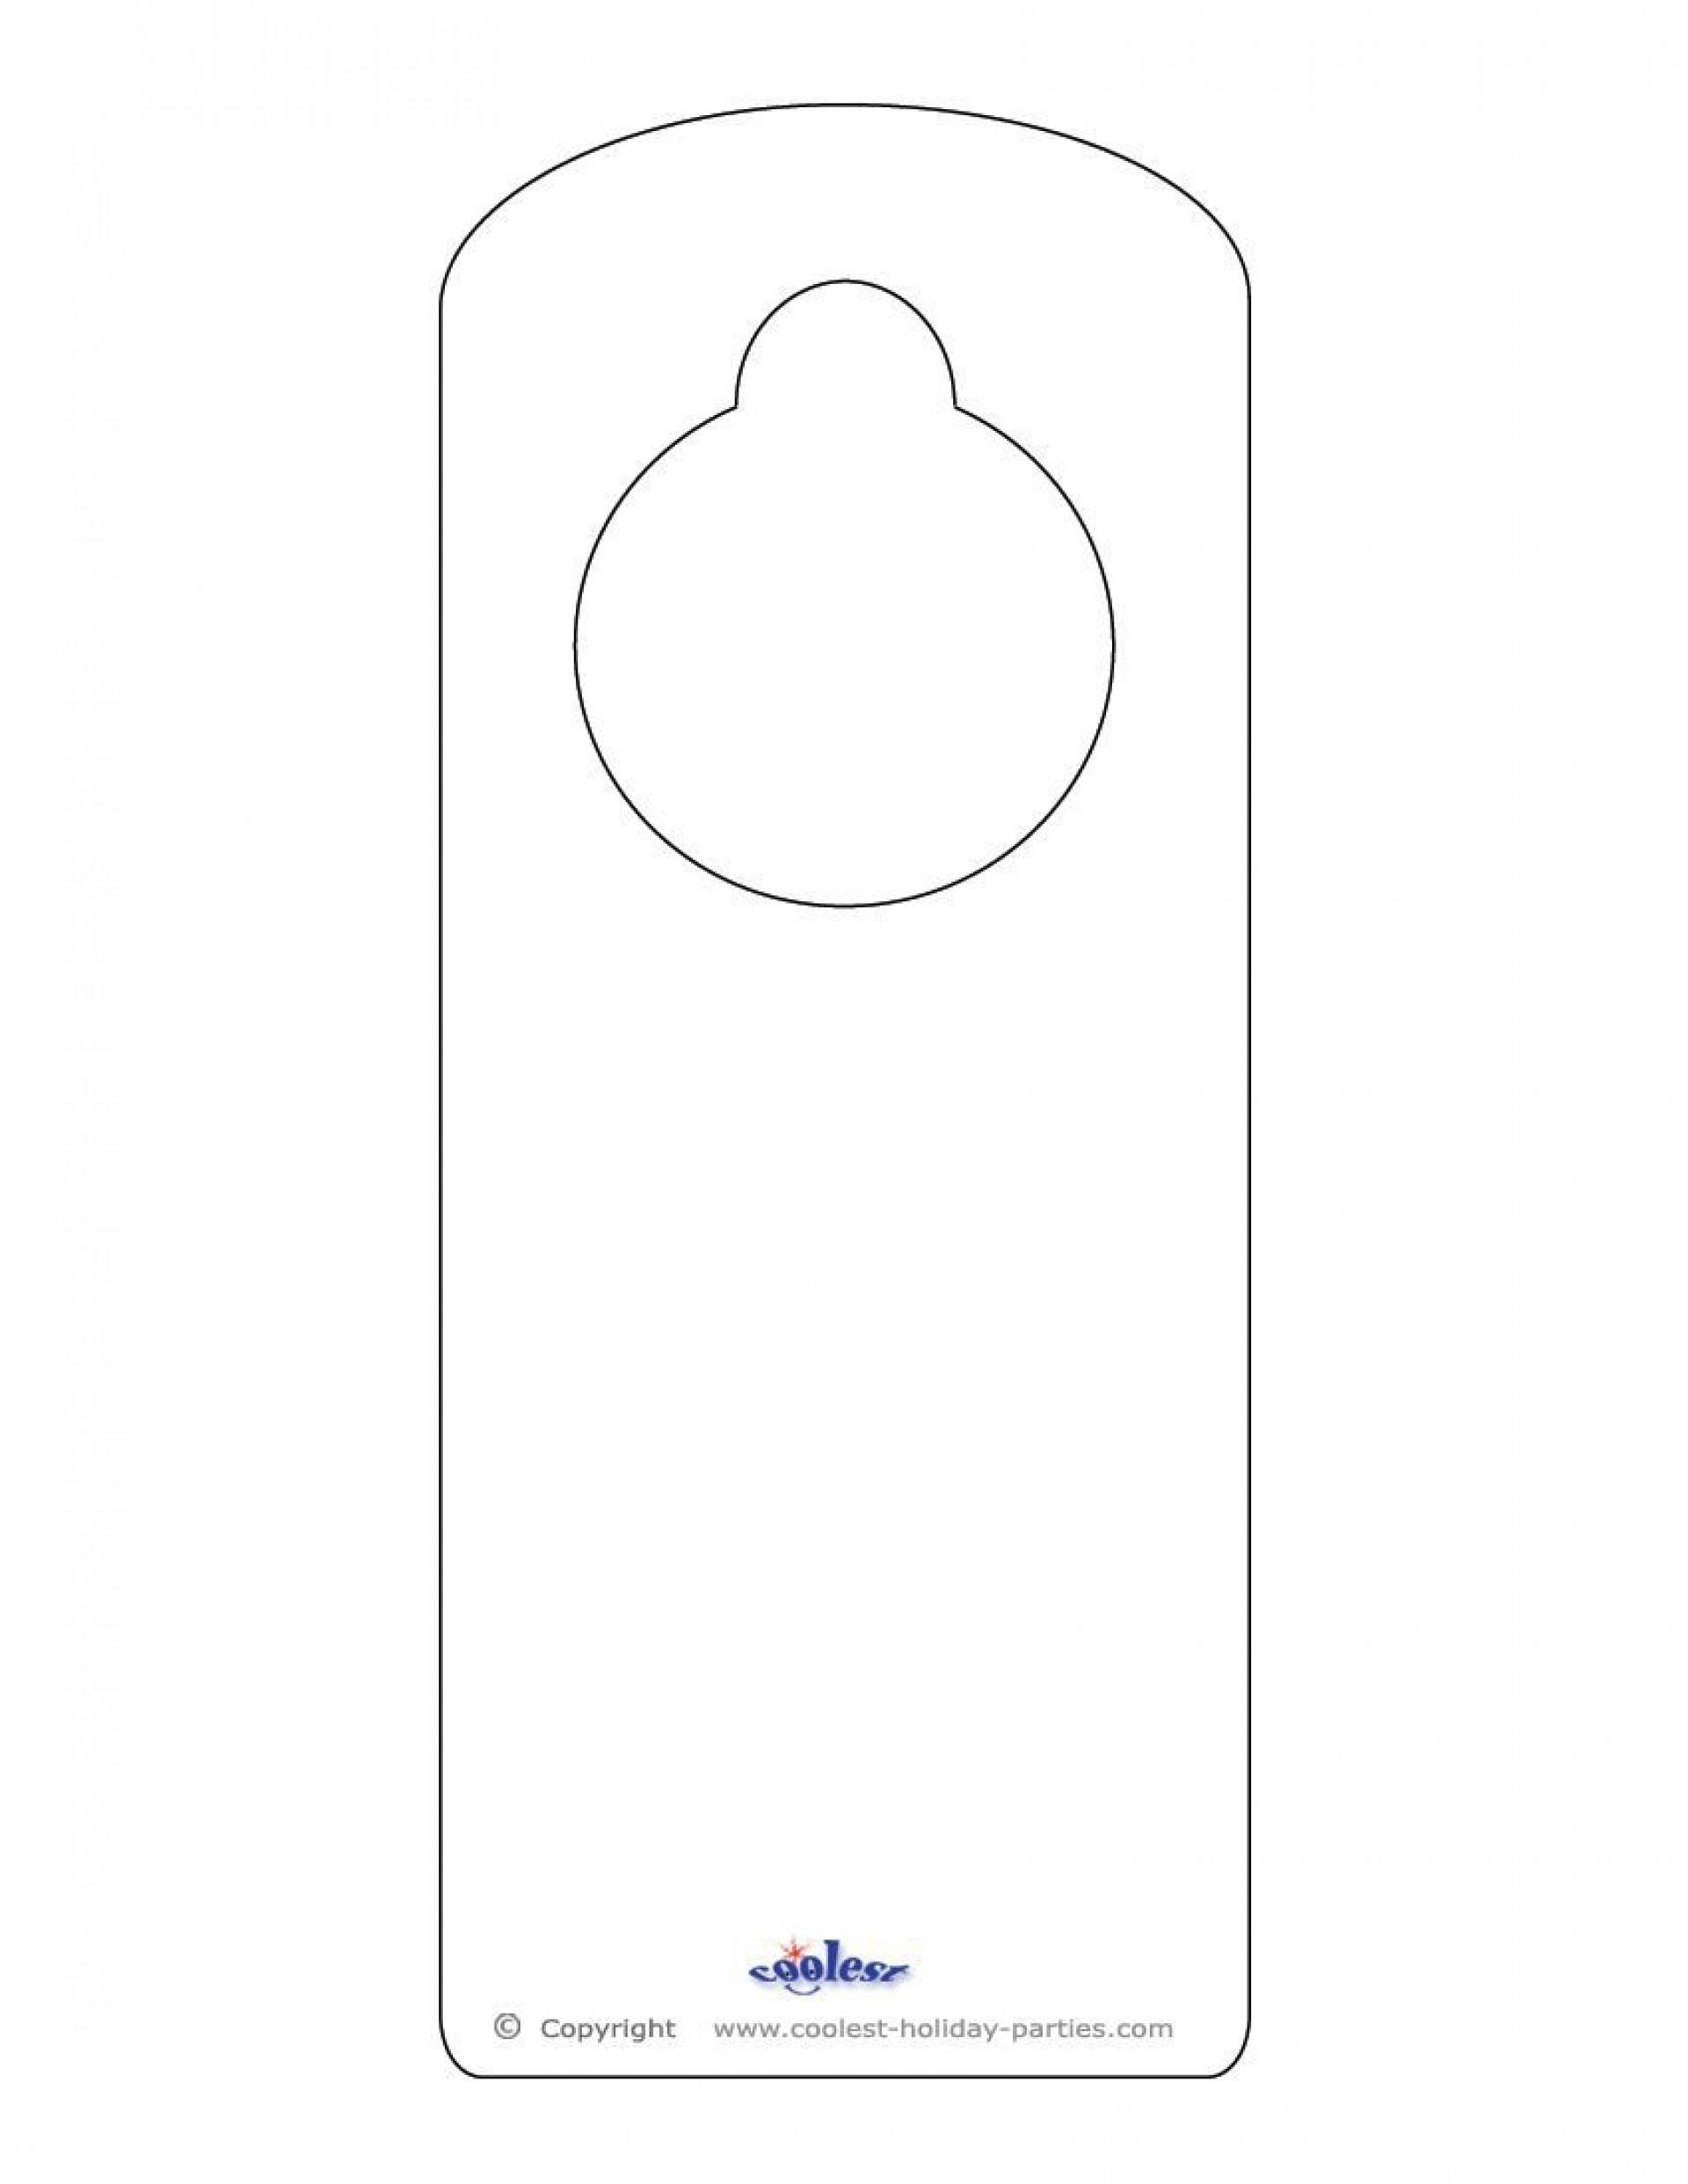 008 Incredible Free Printable Door Hanger Template Design  Templates Wedding Editable1920